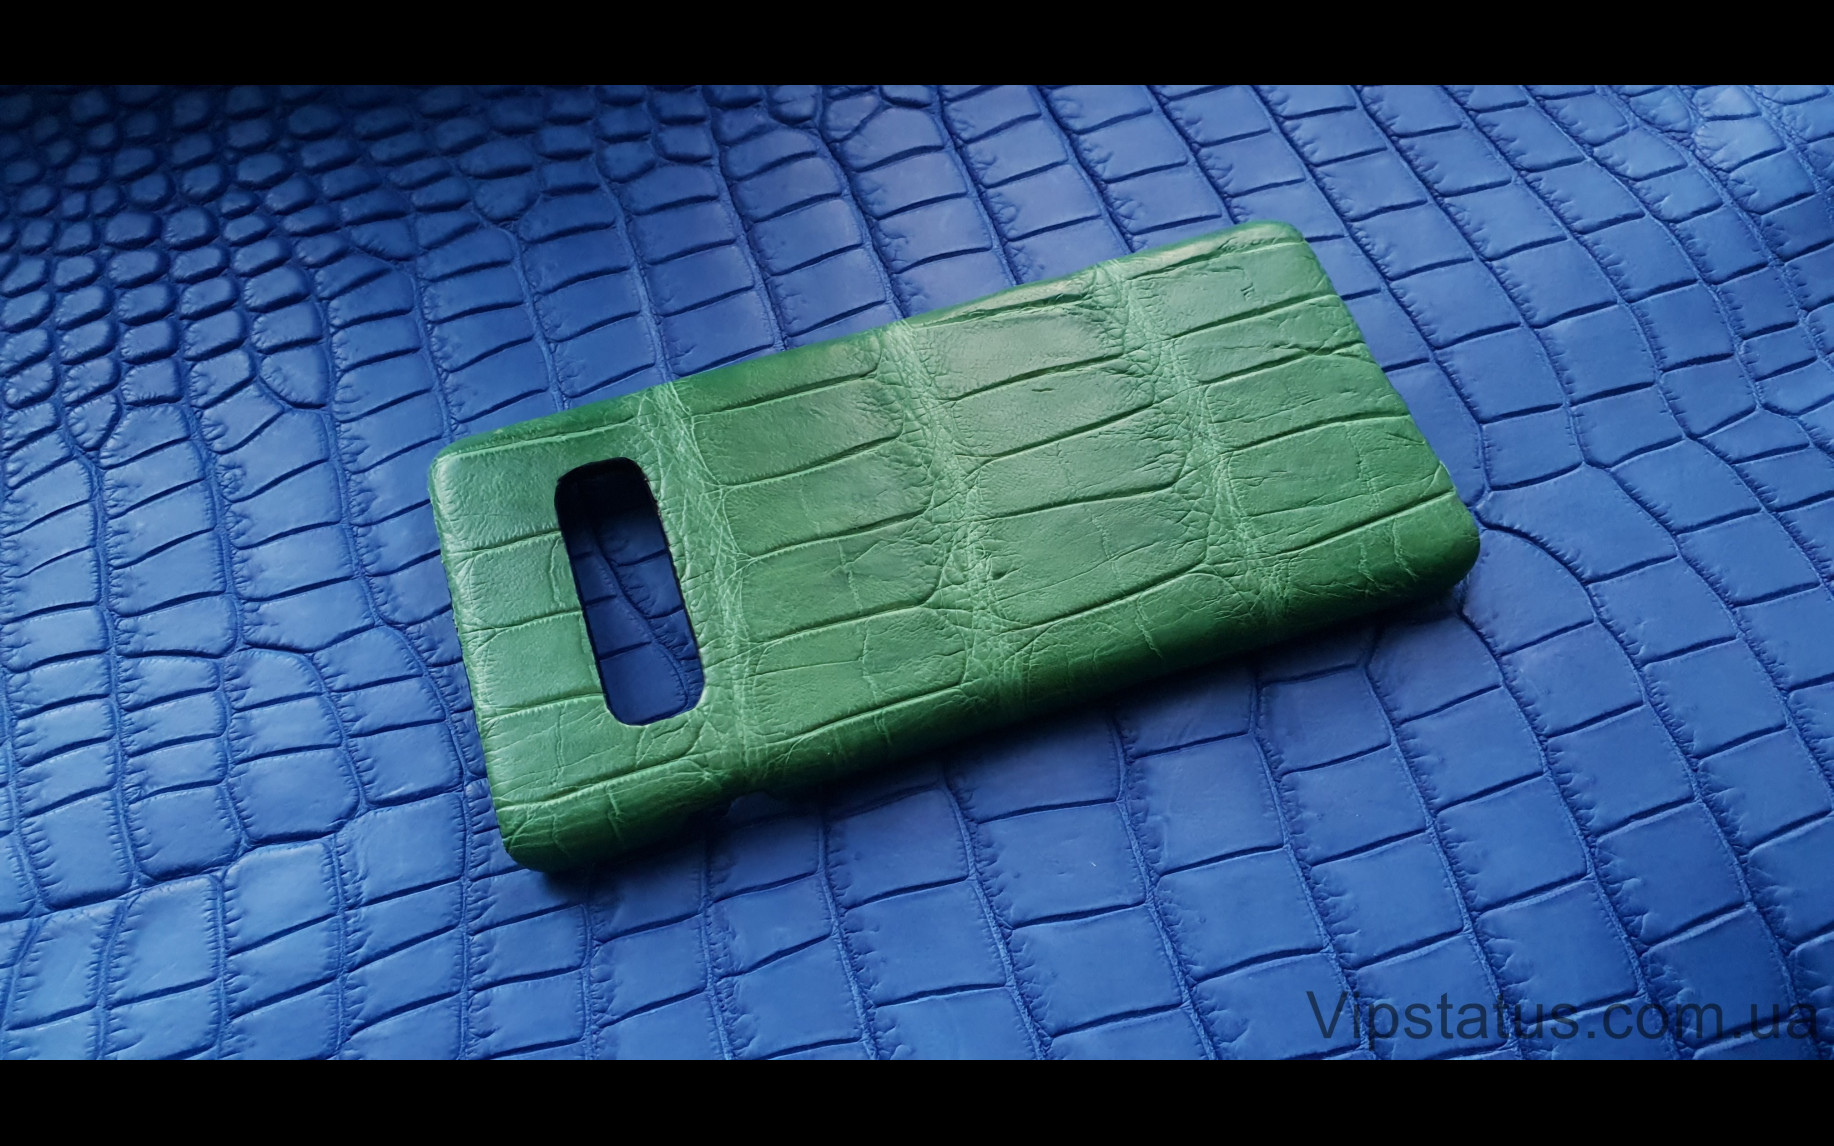 Elite Light Green Экзотический чехол Samsung Galaxy S10 Plus Light Green Exotic case Samsung Galaxy S10 Plus Crocodile leather image 1